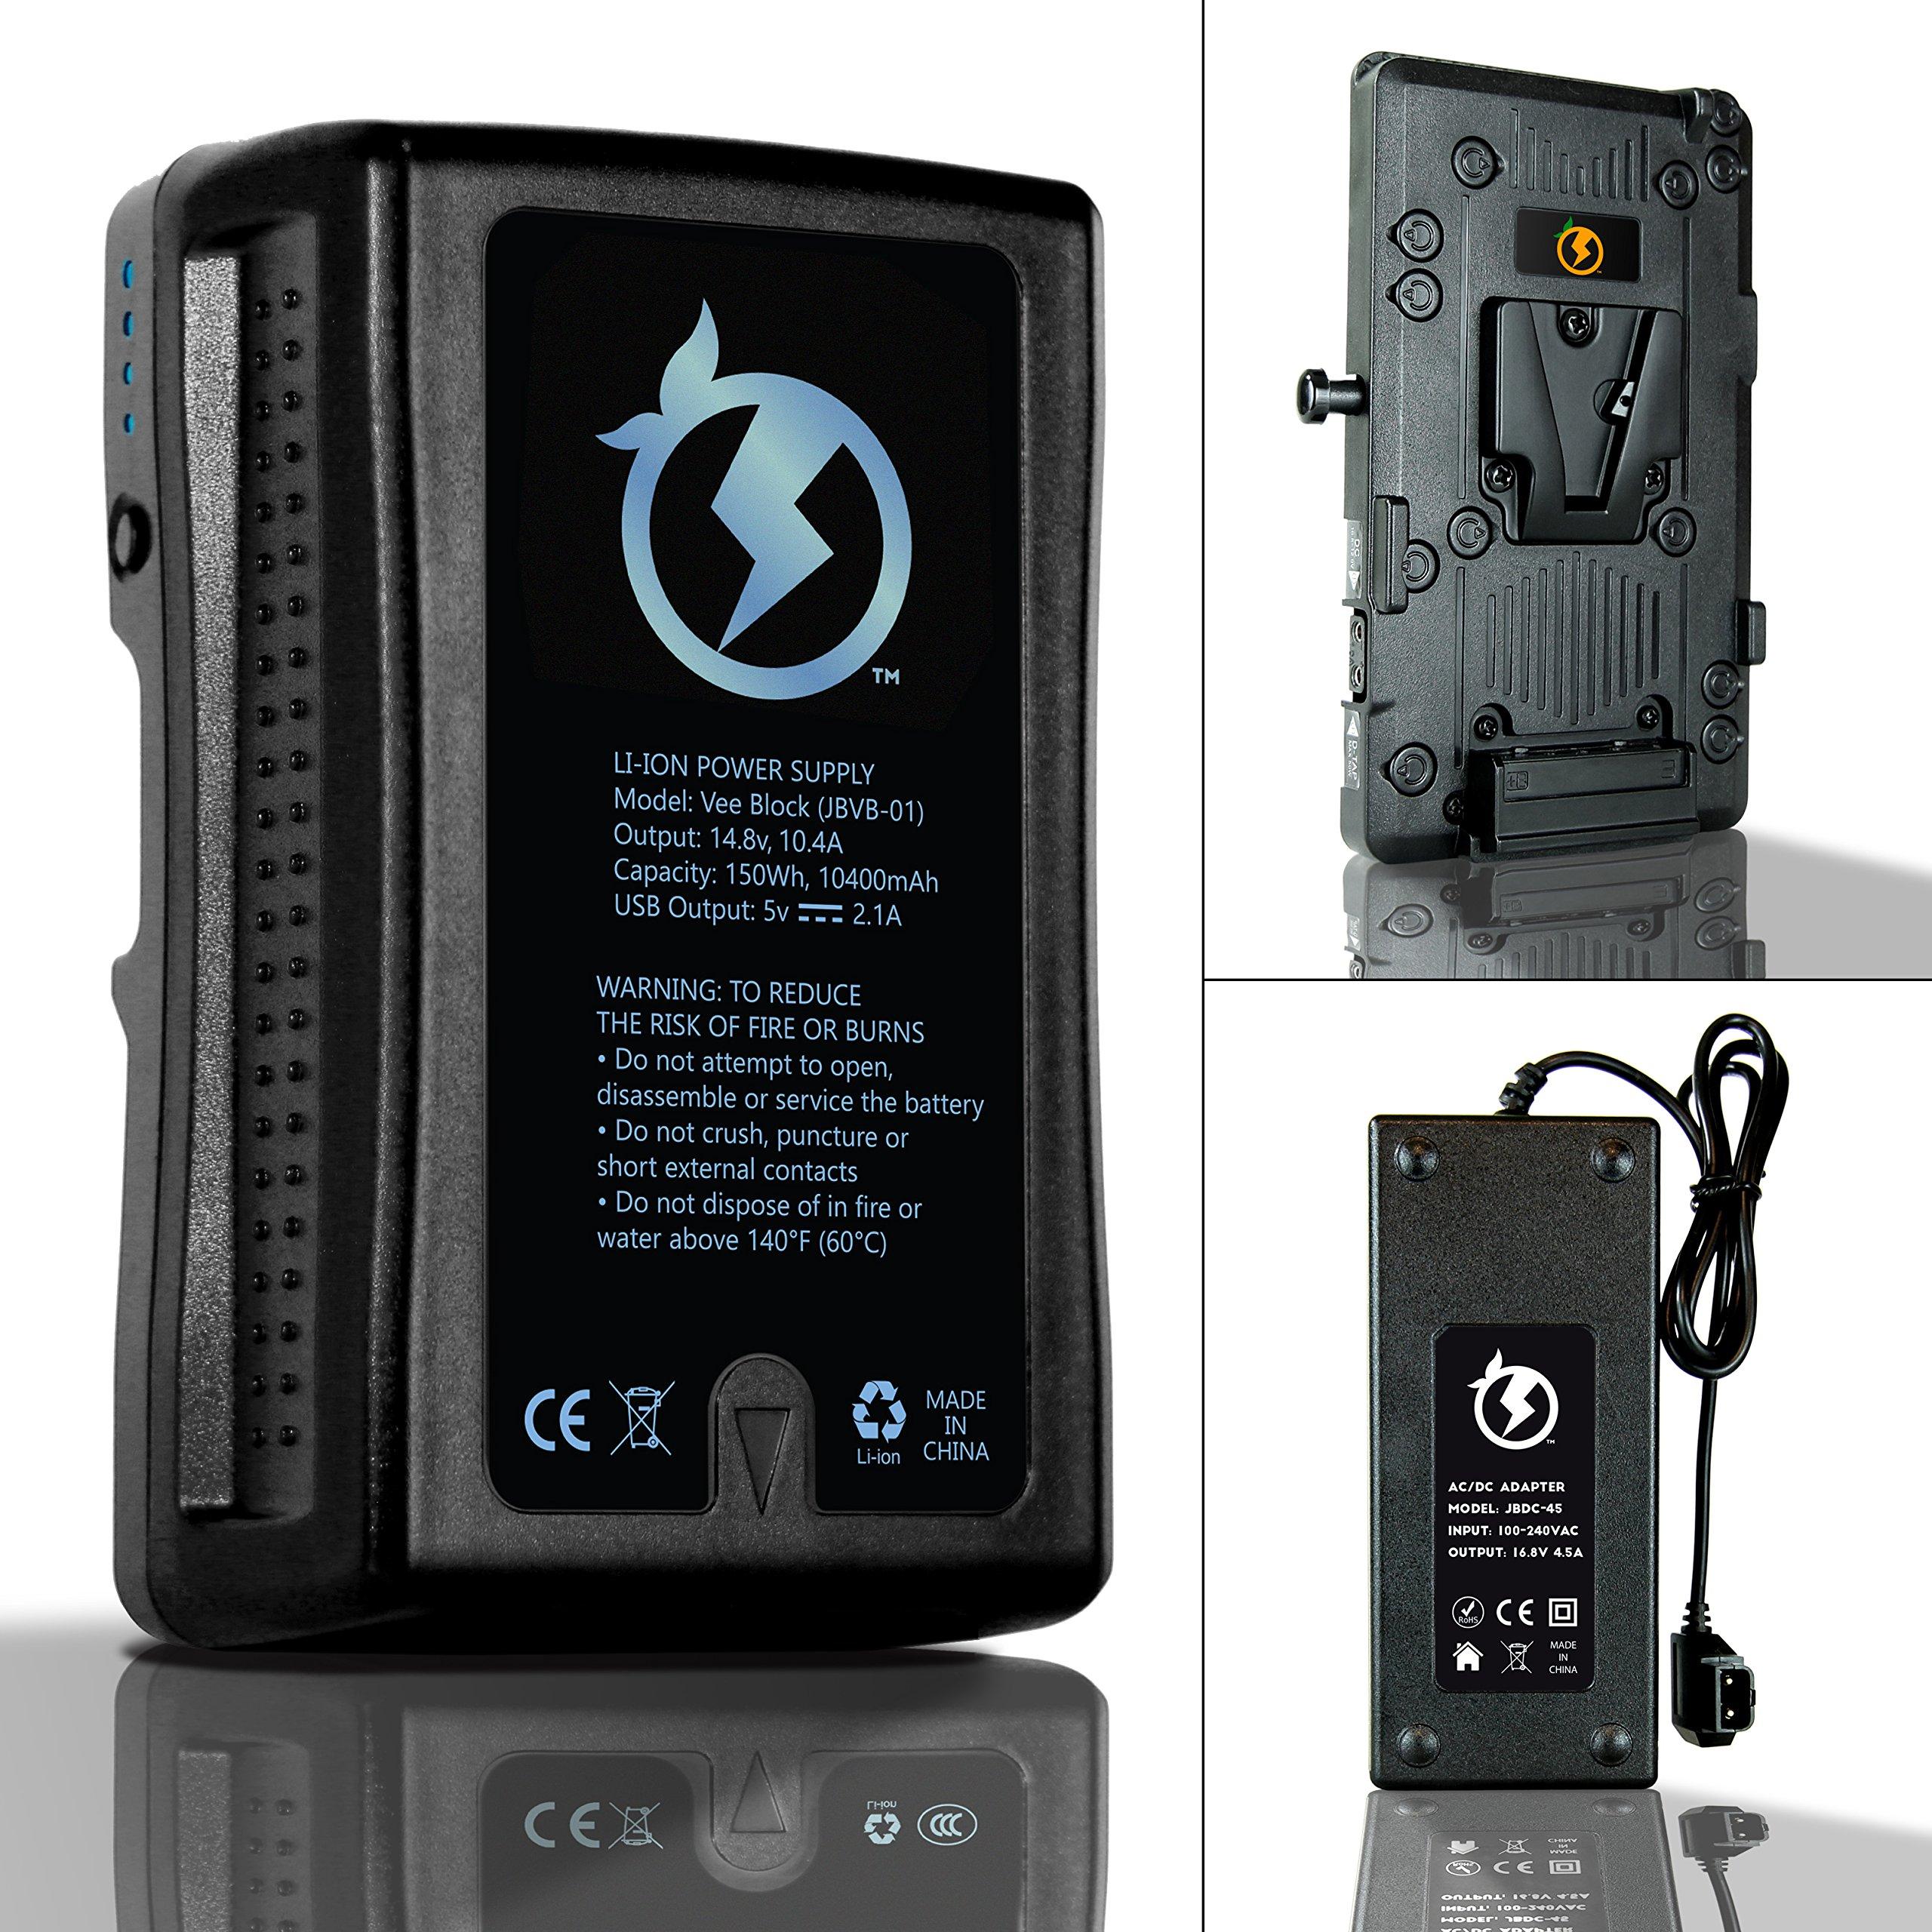 Juicebox Complete Battery Kit for Blackmagic Ursa and Ursa Mini by Juice Box